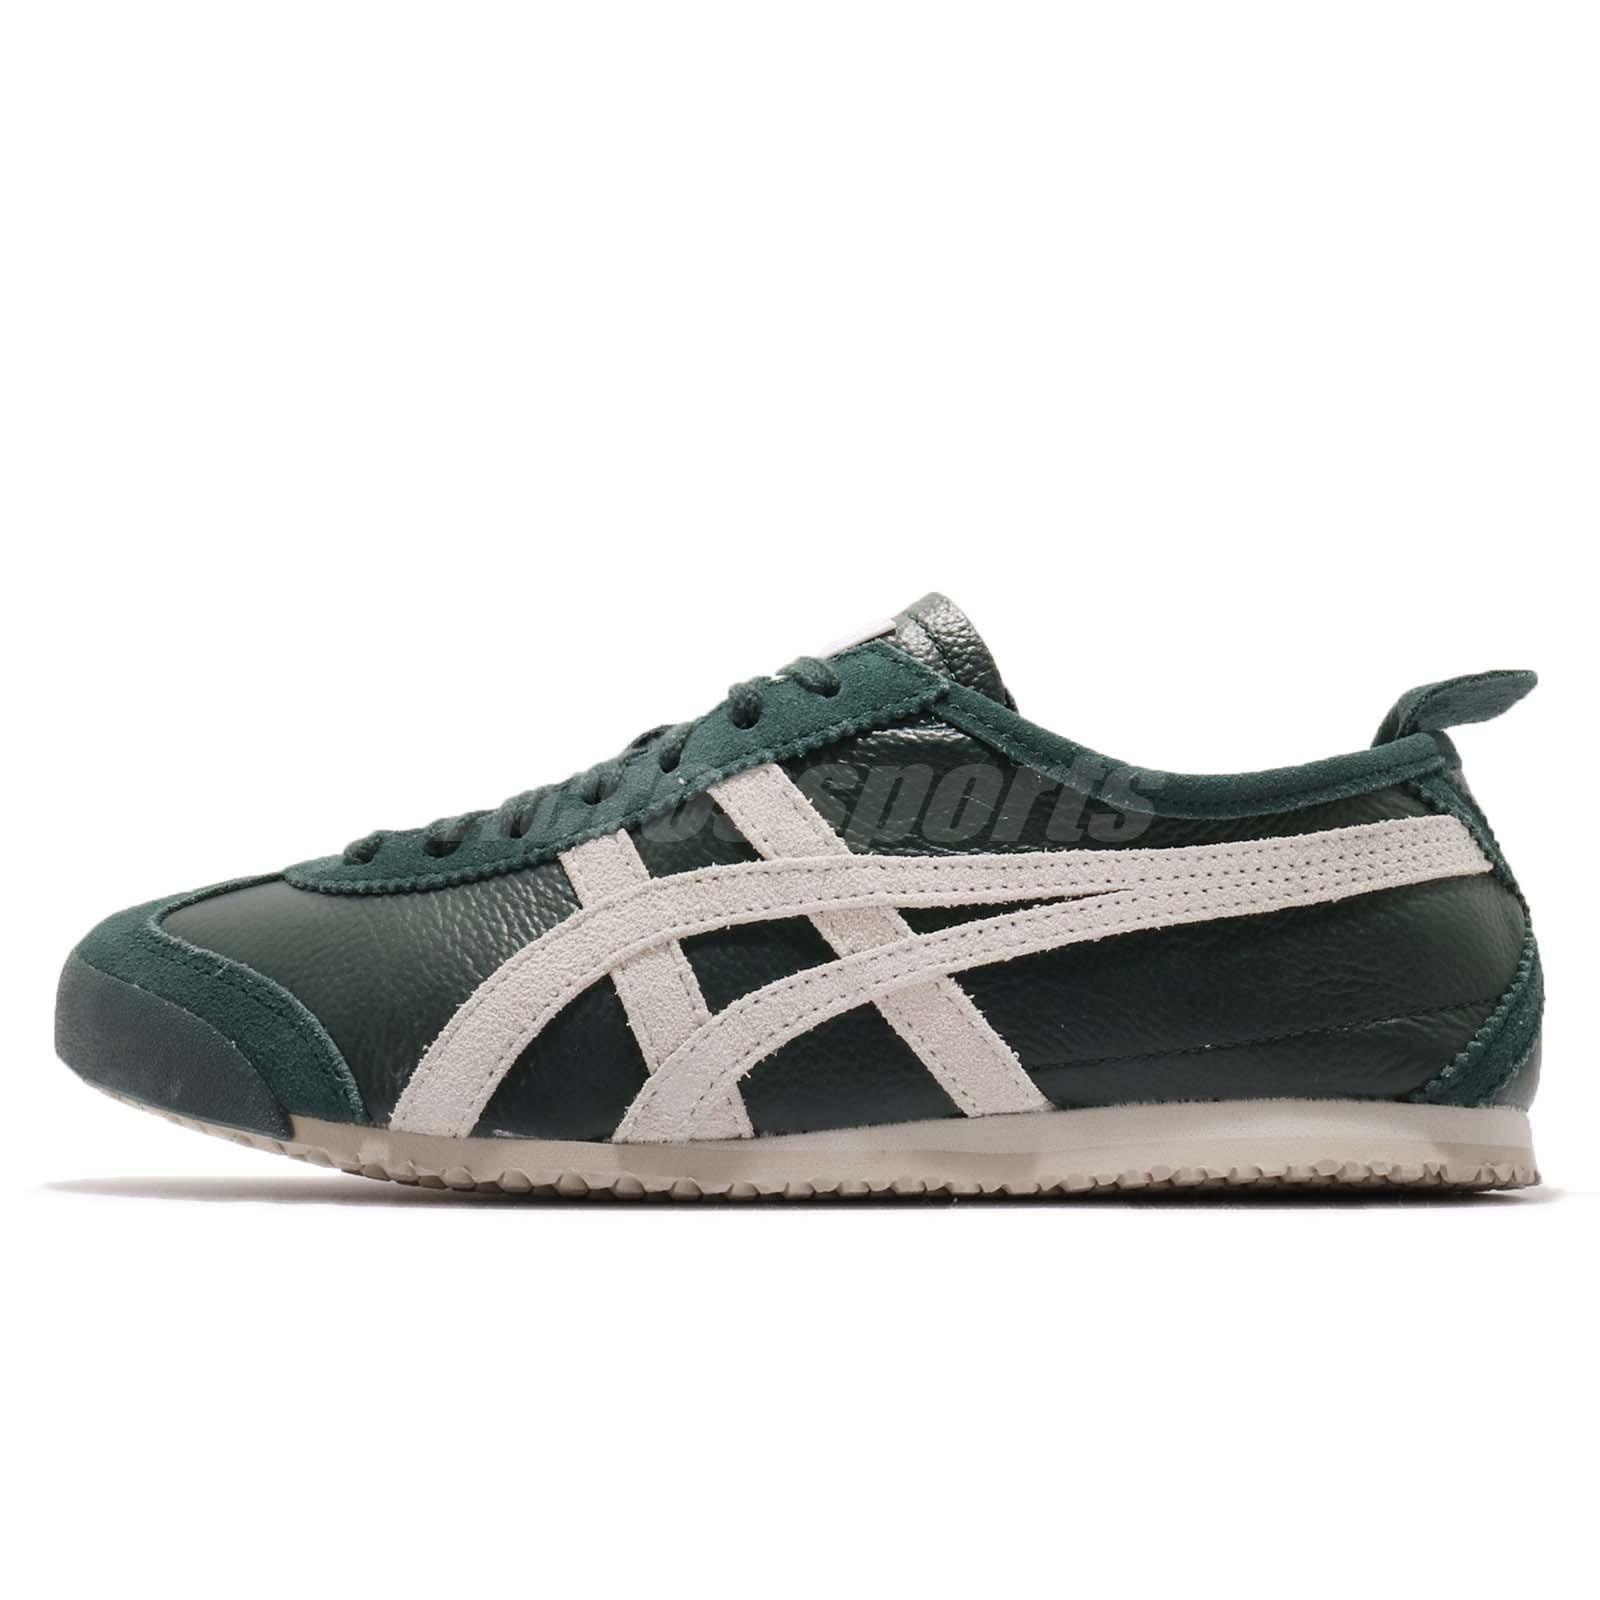 size 40 9b11b 5fefd Details about Asics Onitsuka Tiger Mexico 66 Vin Green Birch Men Running  Shoes D2J4L-8502